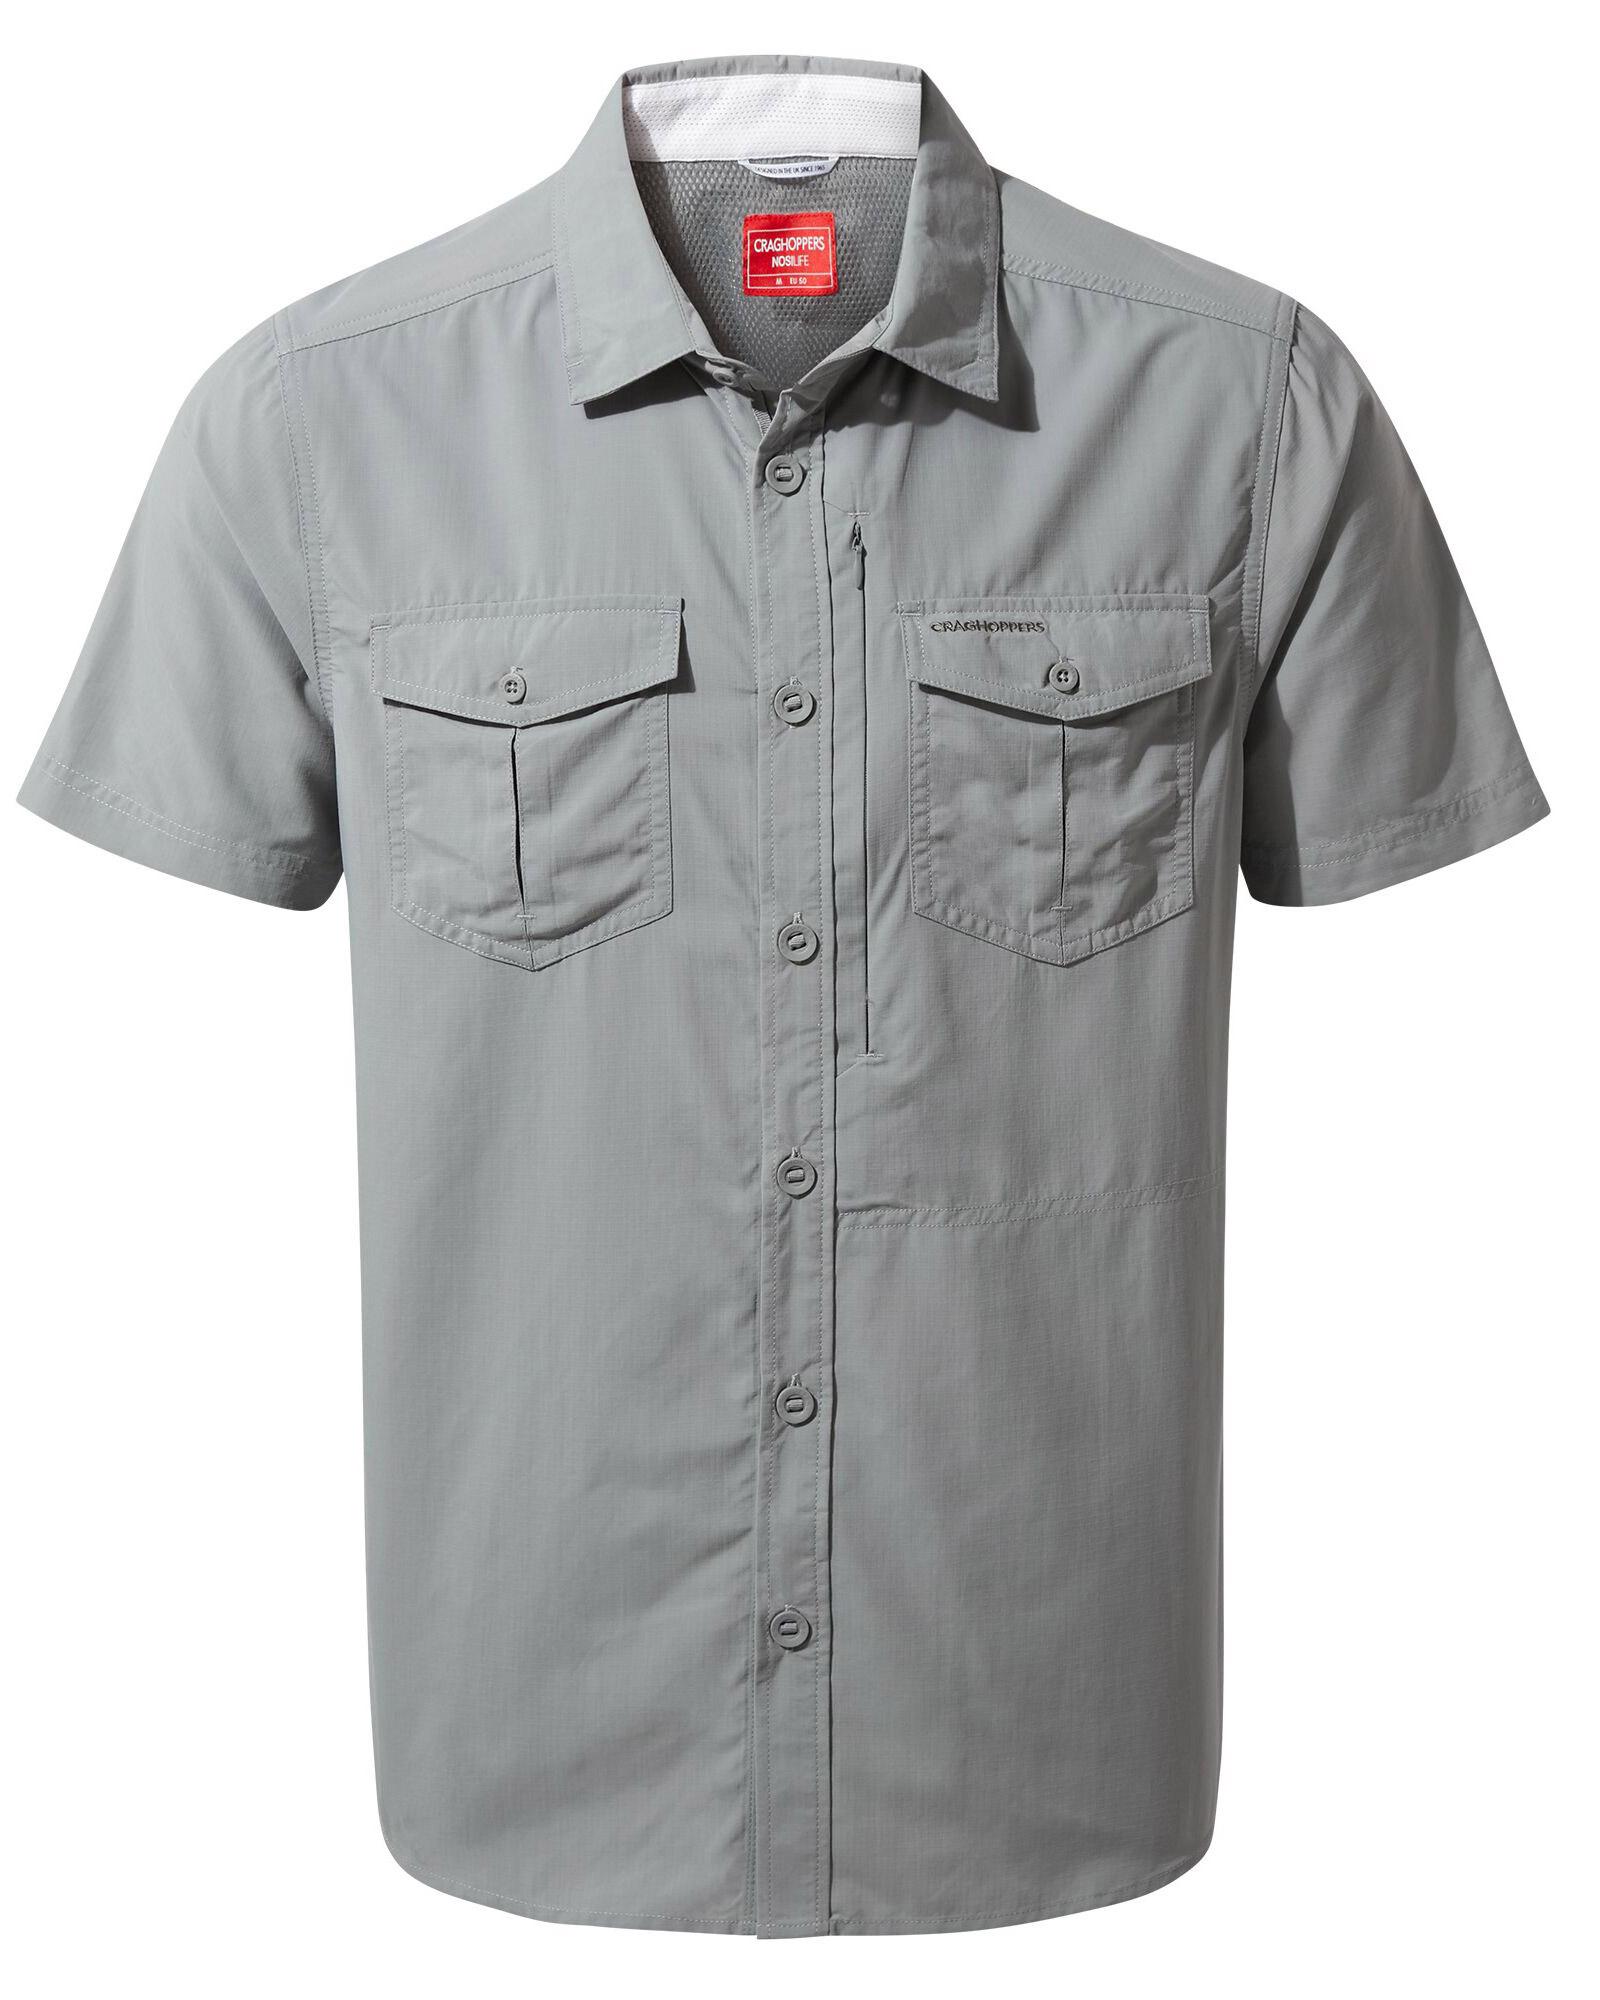 Craghoppers Men's NosiLife Short Sleeve Adventure Shirt 0